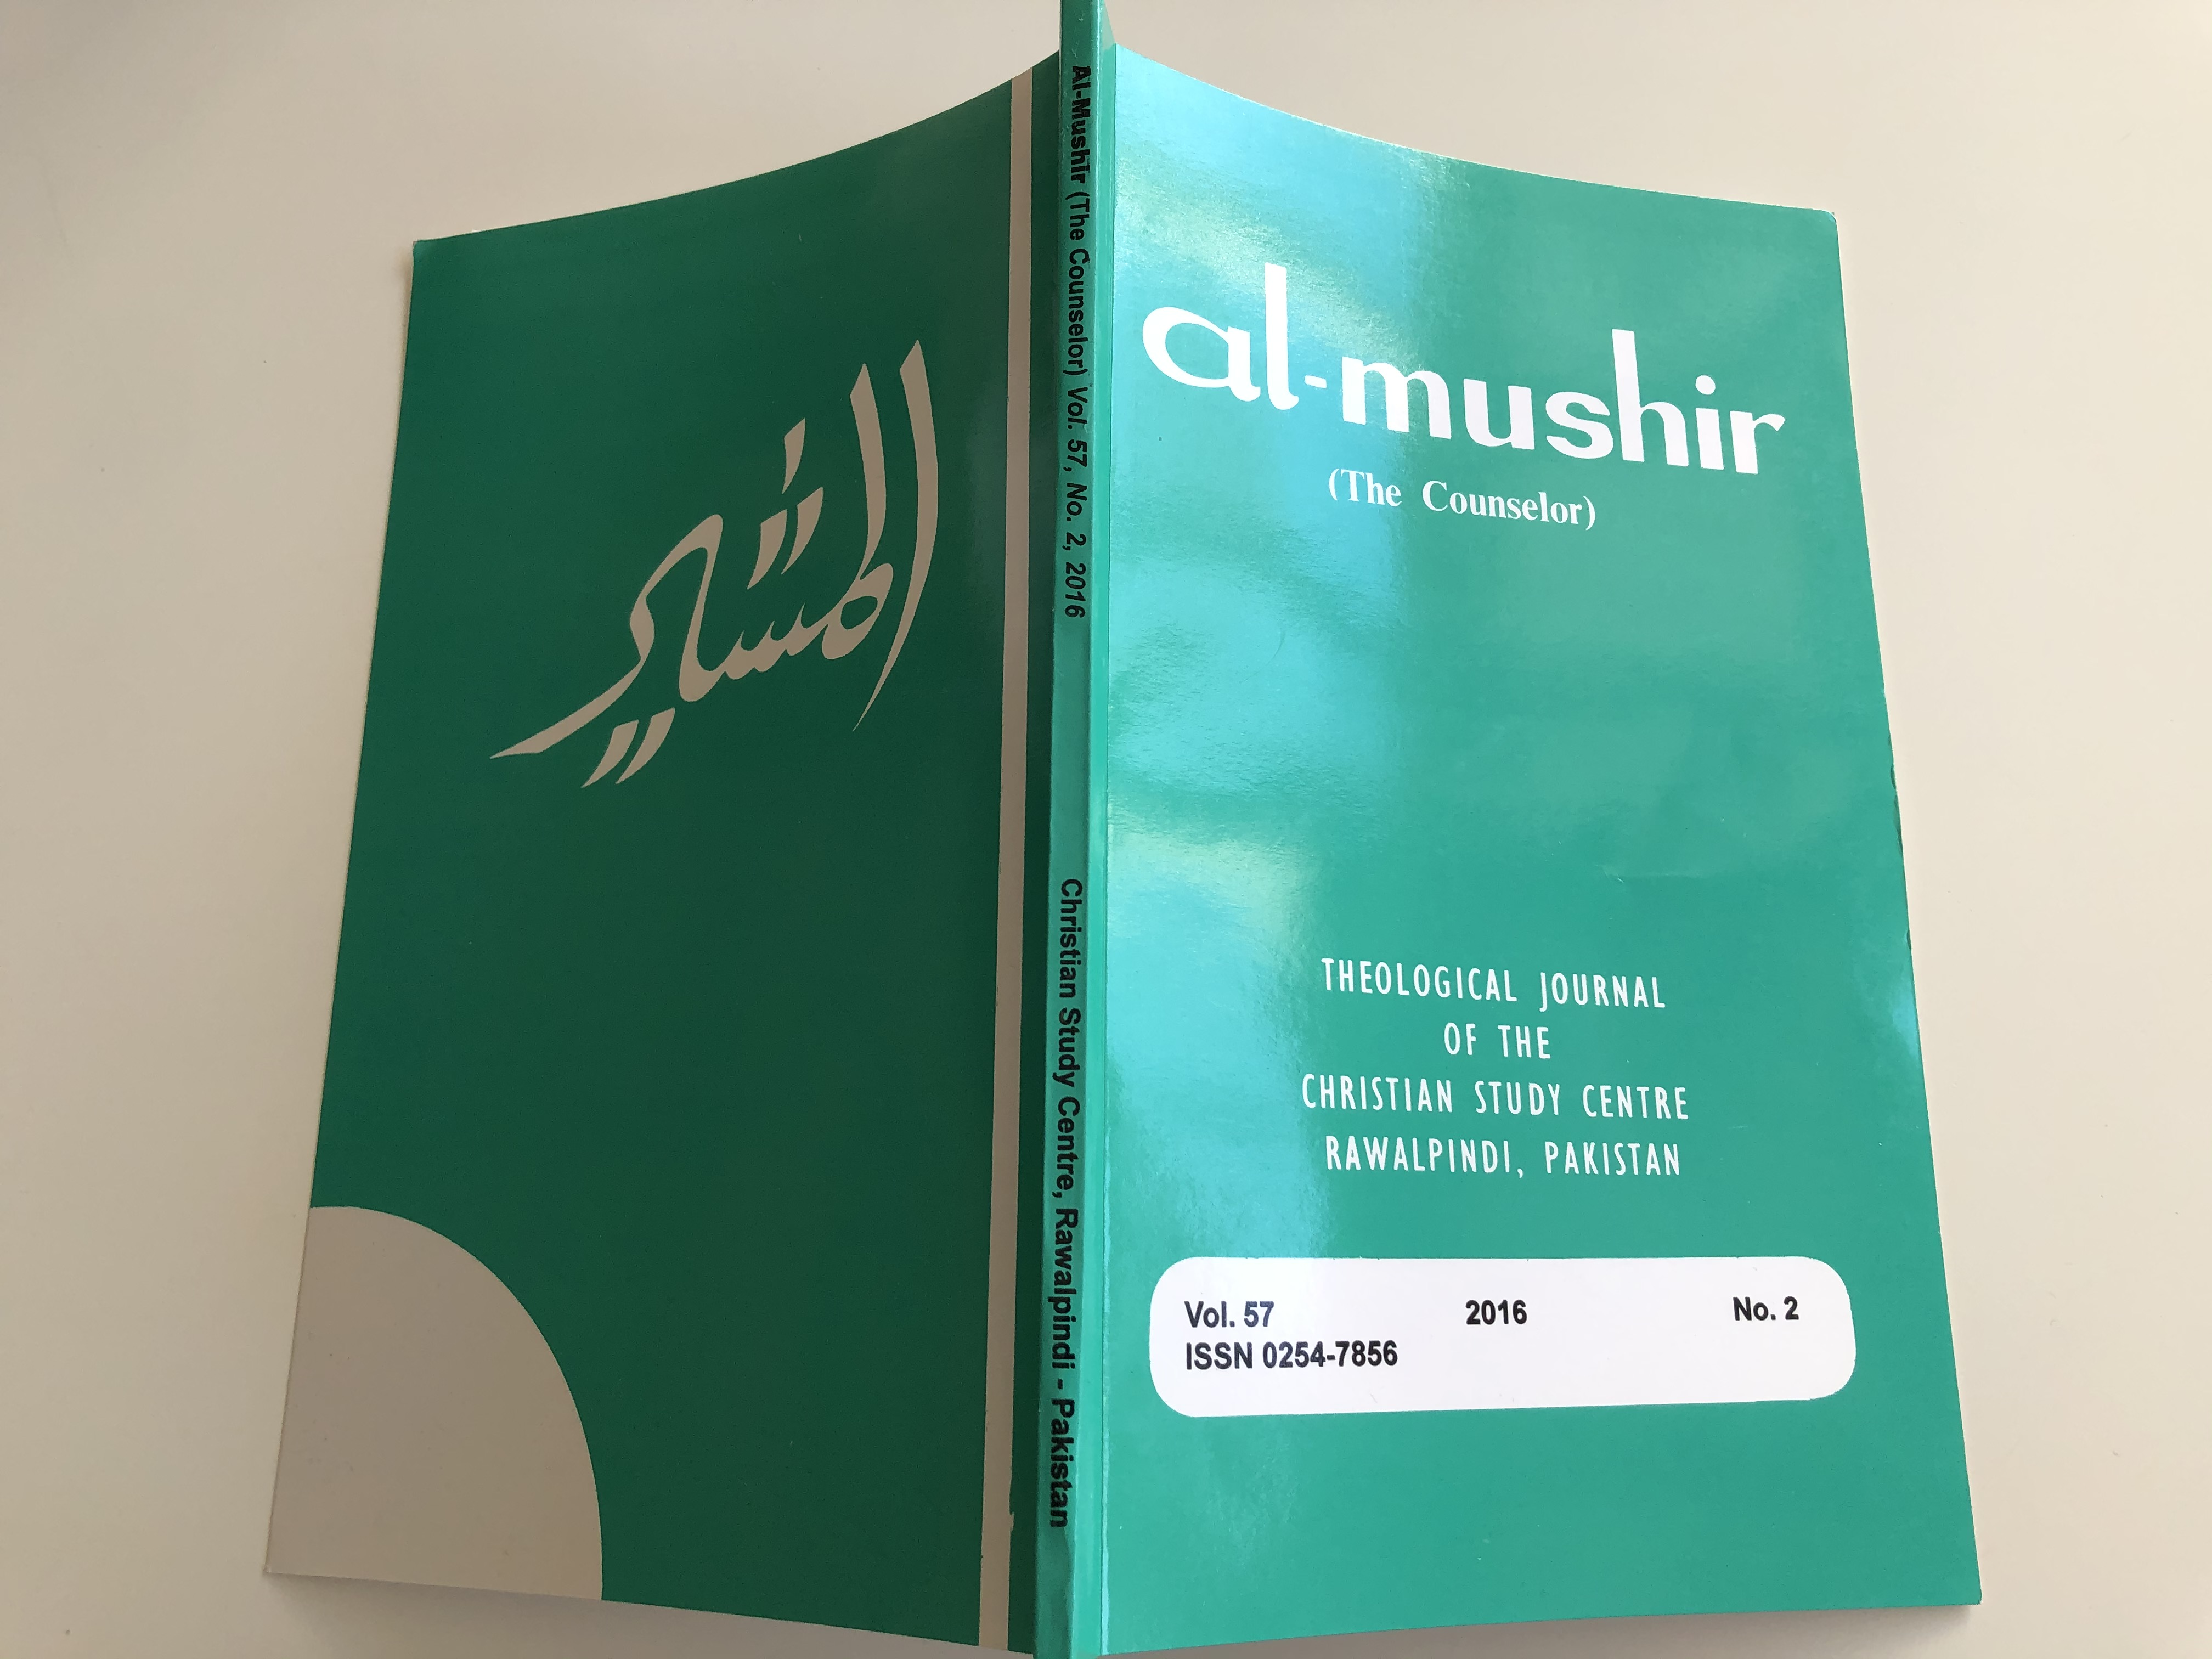 al-mushir-the-counselor-volume-57.-no.-2-13.jpg